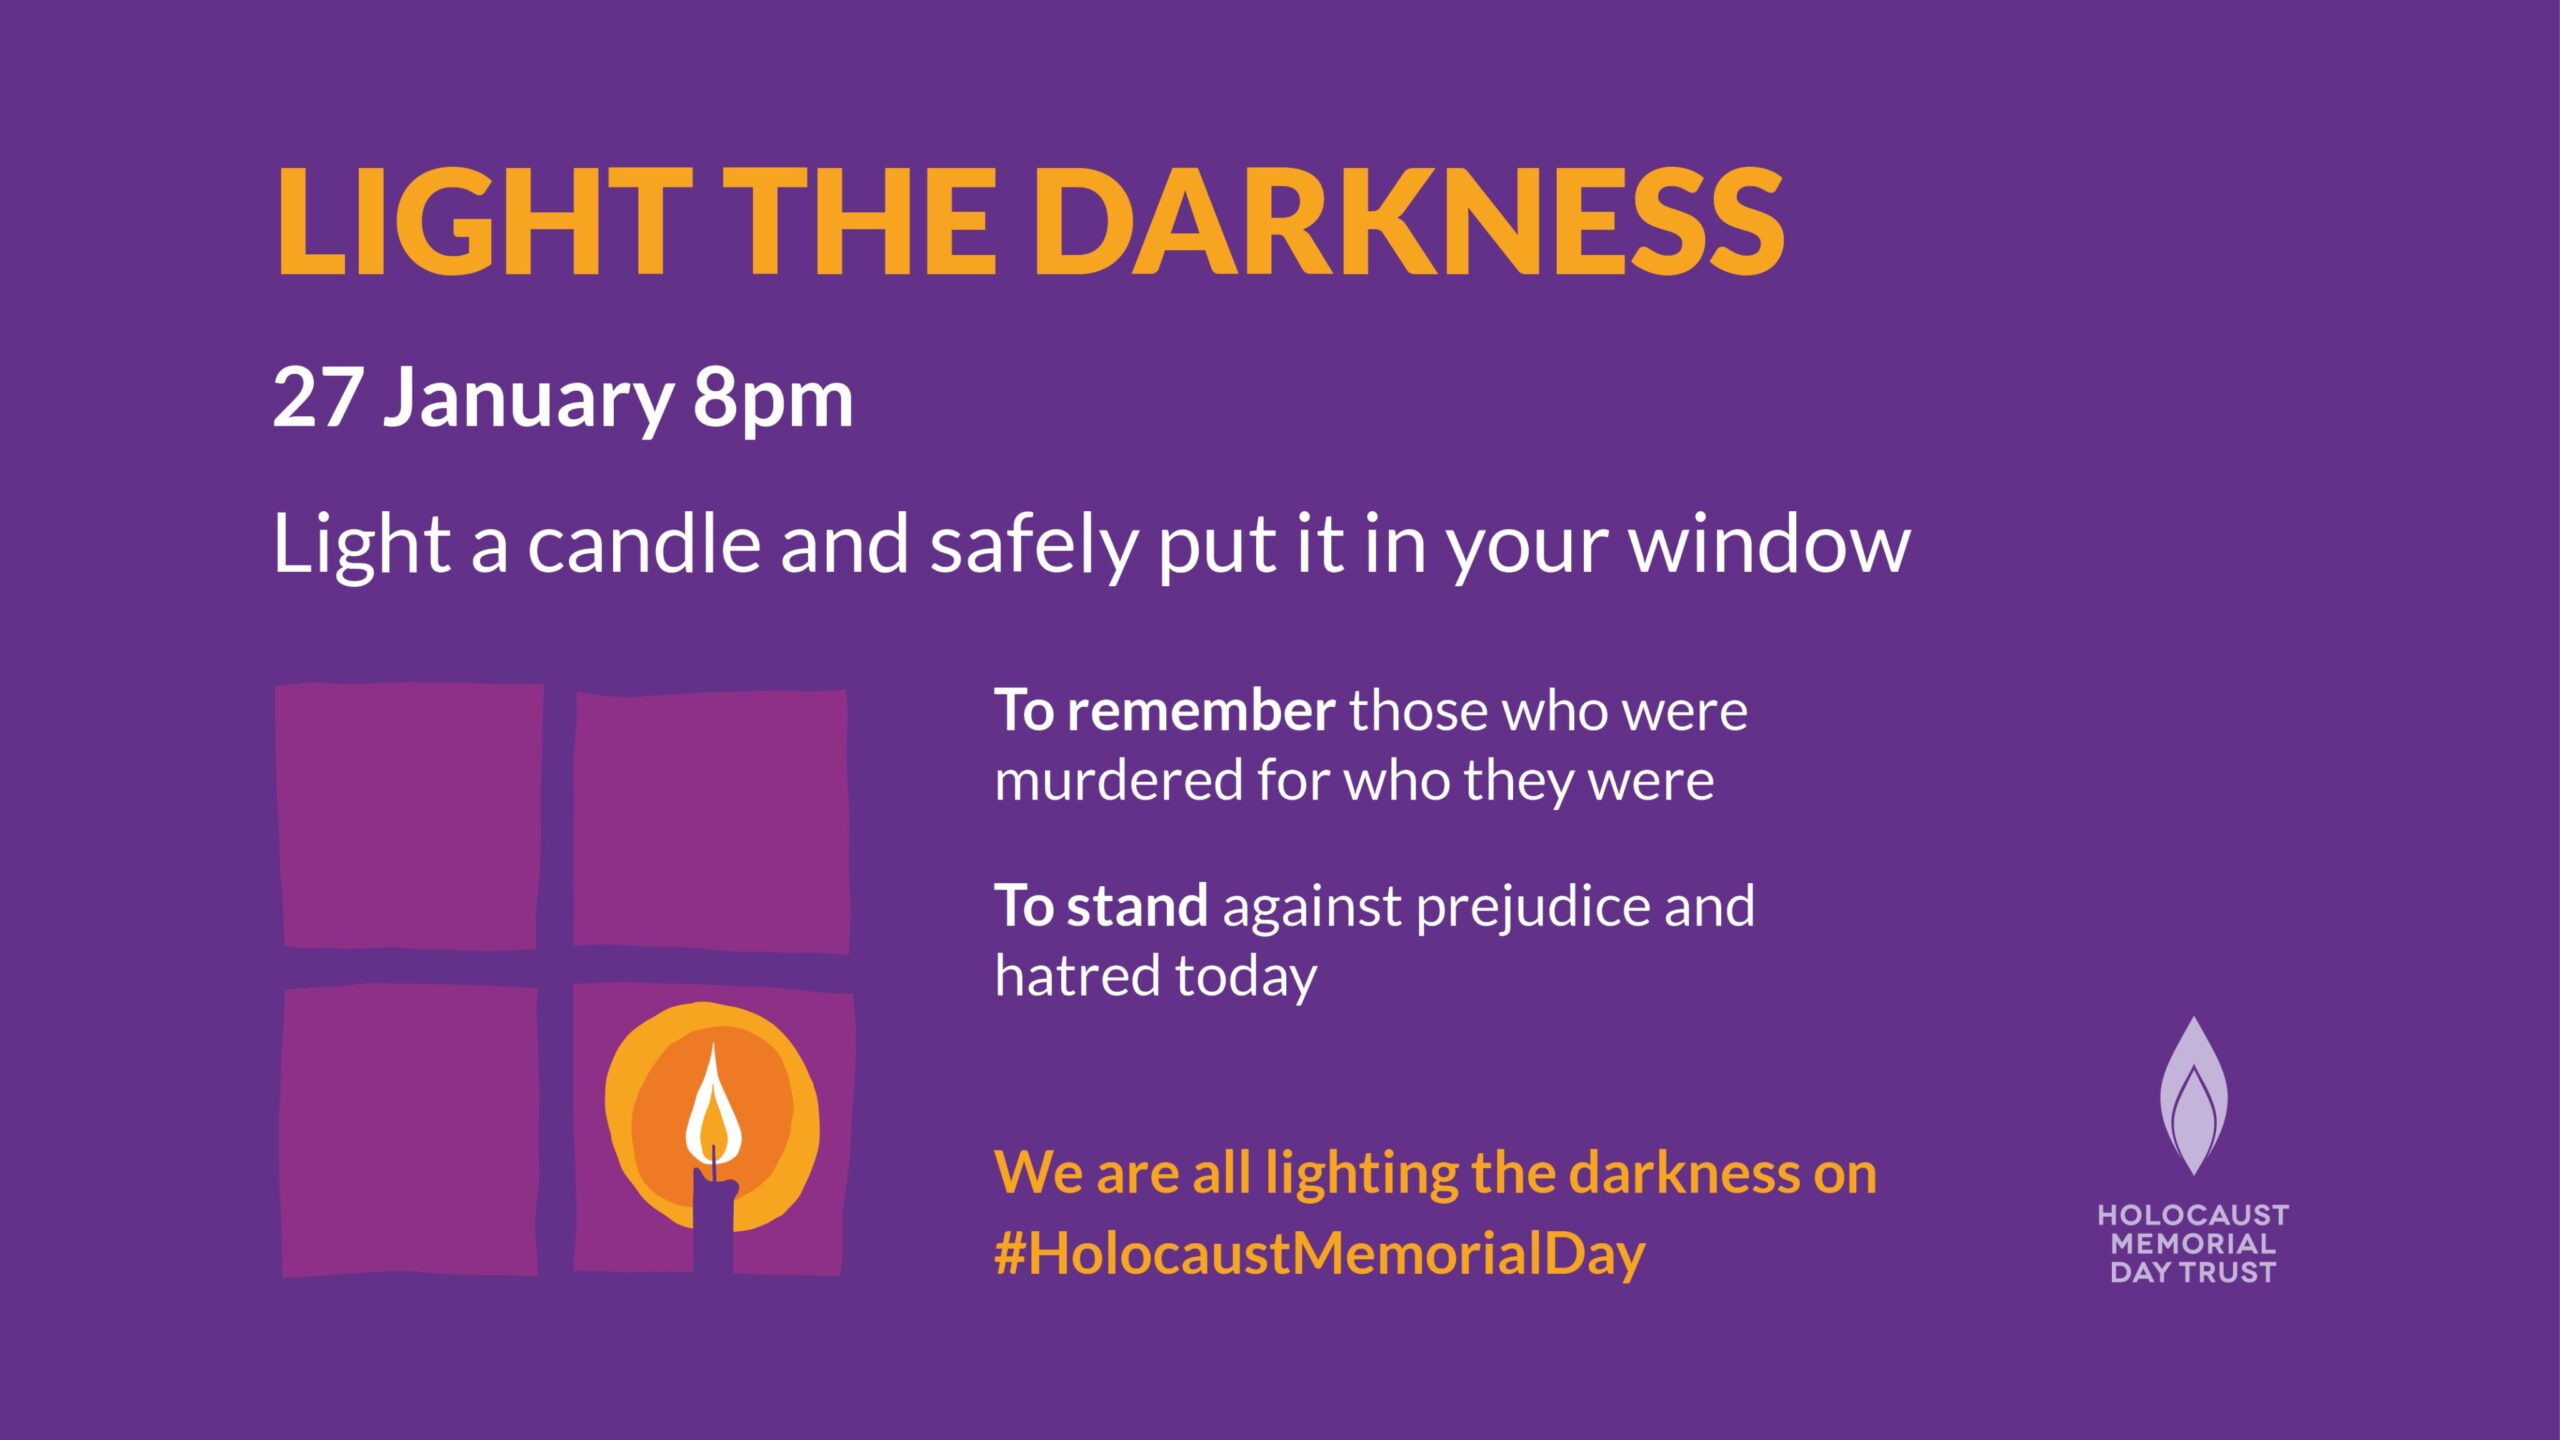 Today Holocaust Memorial Day